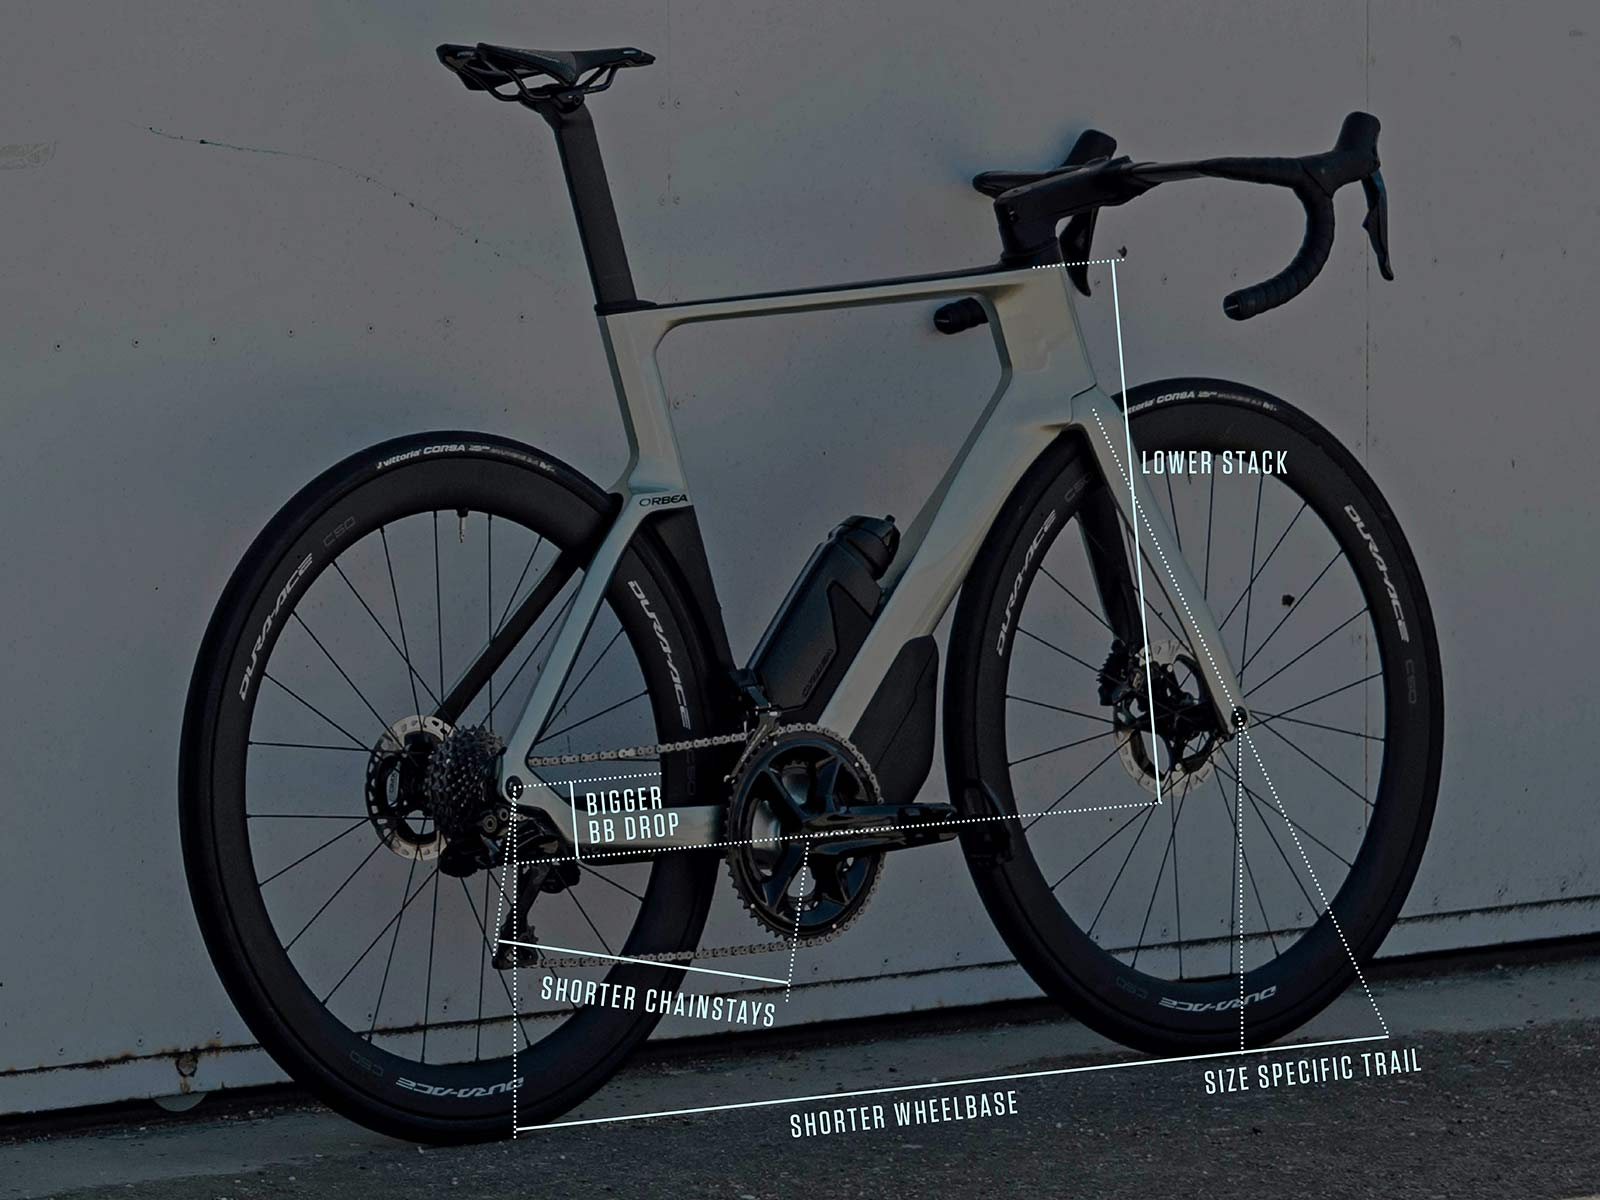 2022 Orbea Orca Aero carbon road bike, geo tweak